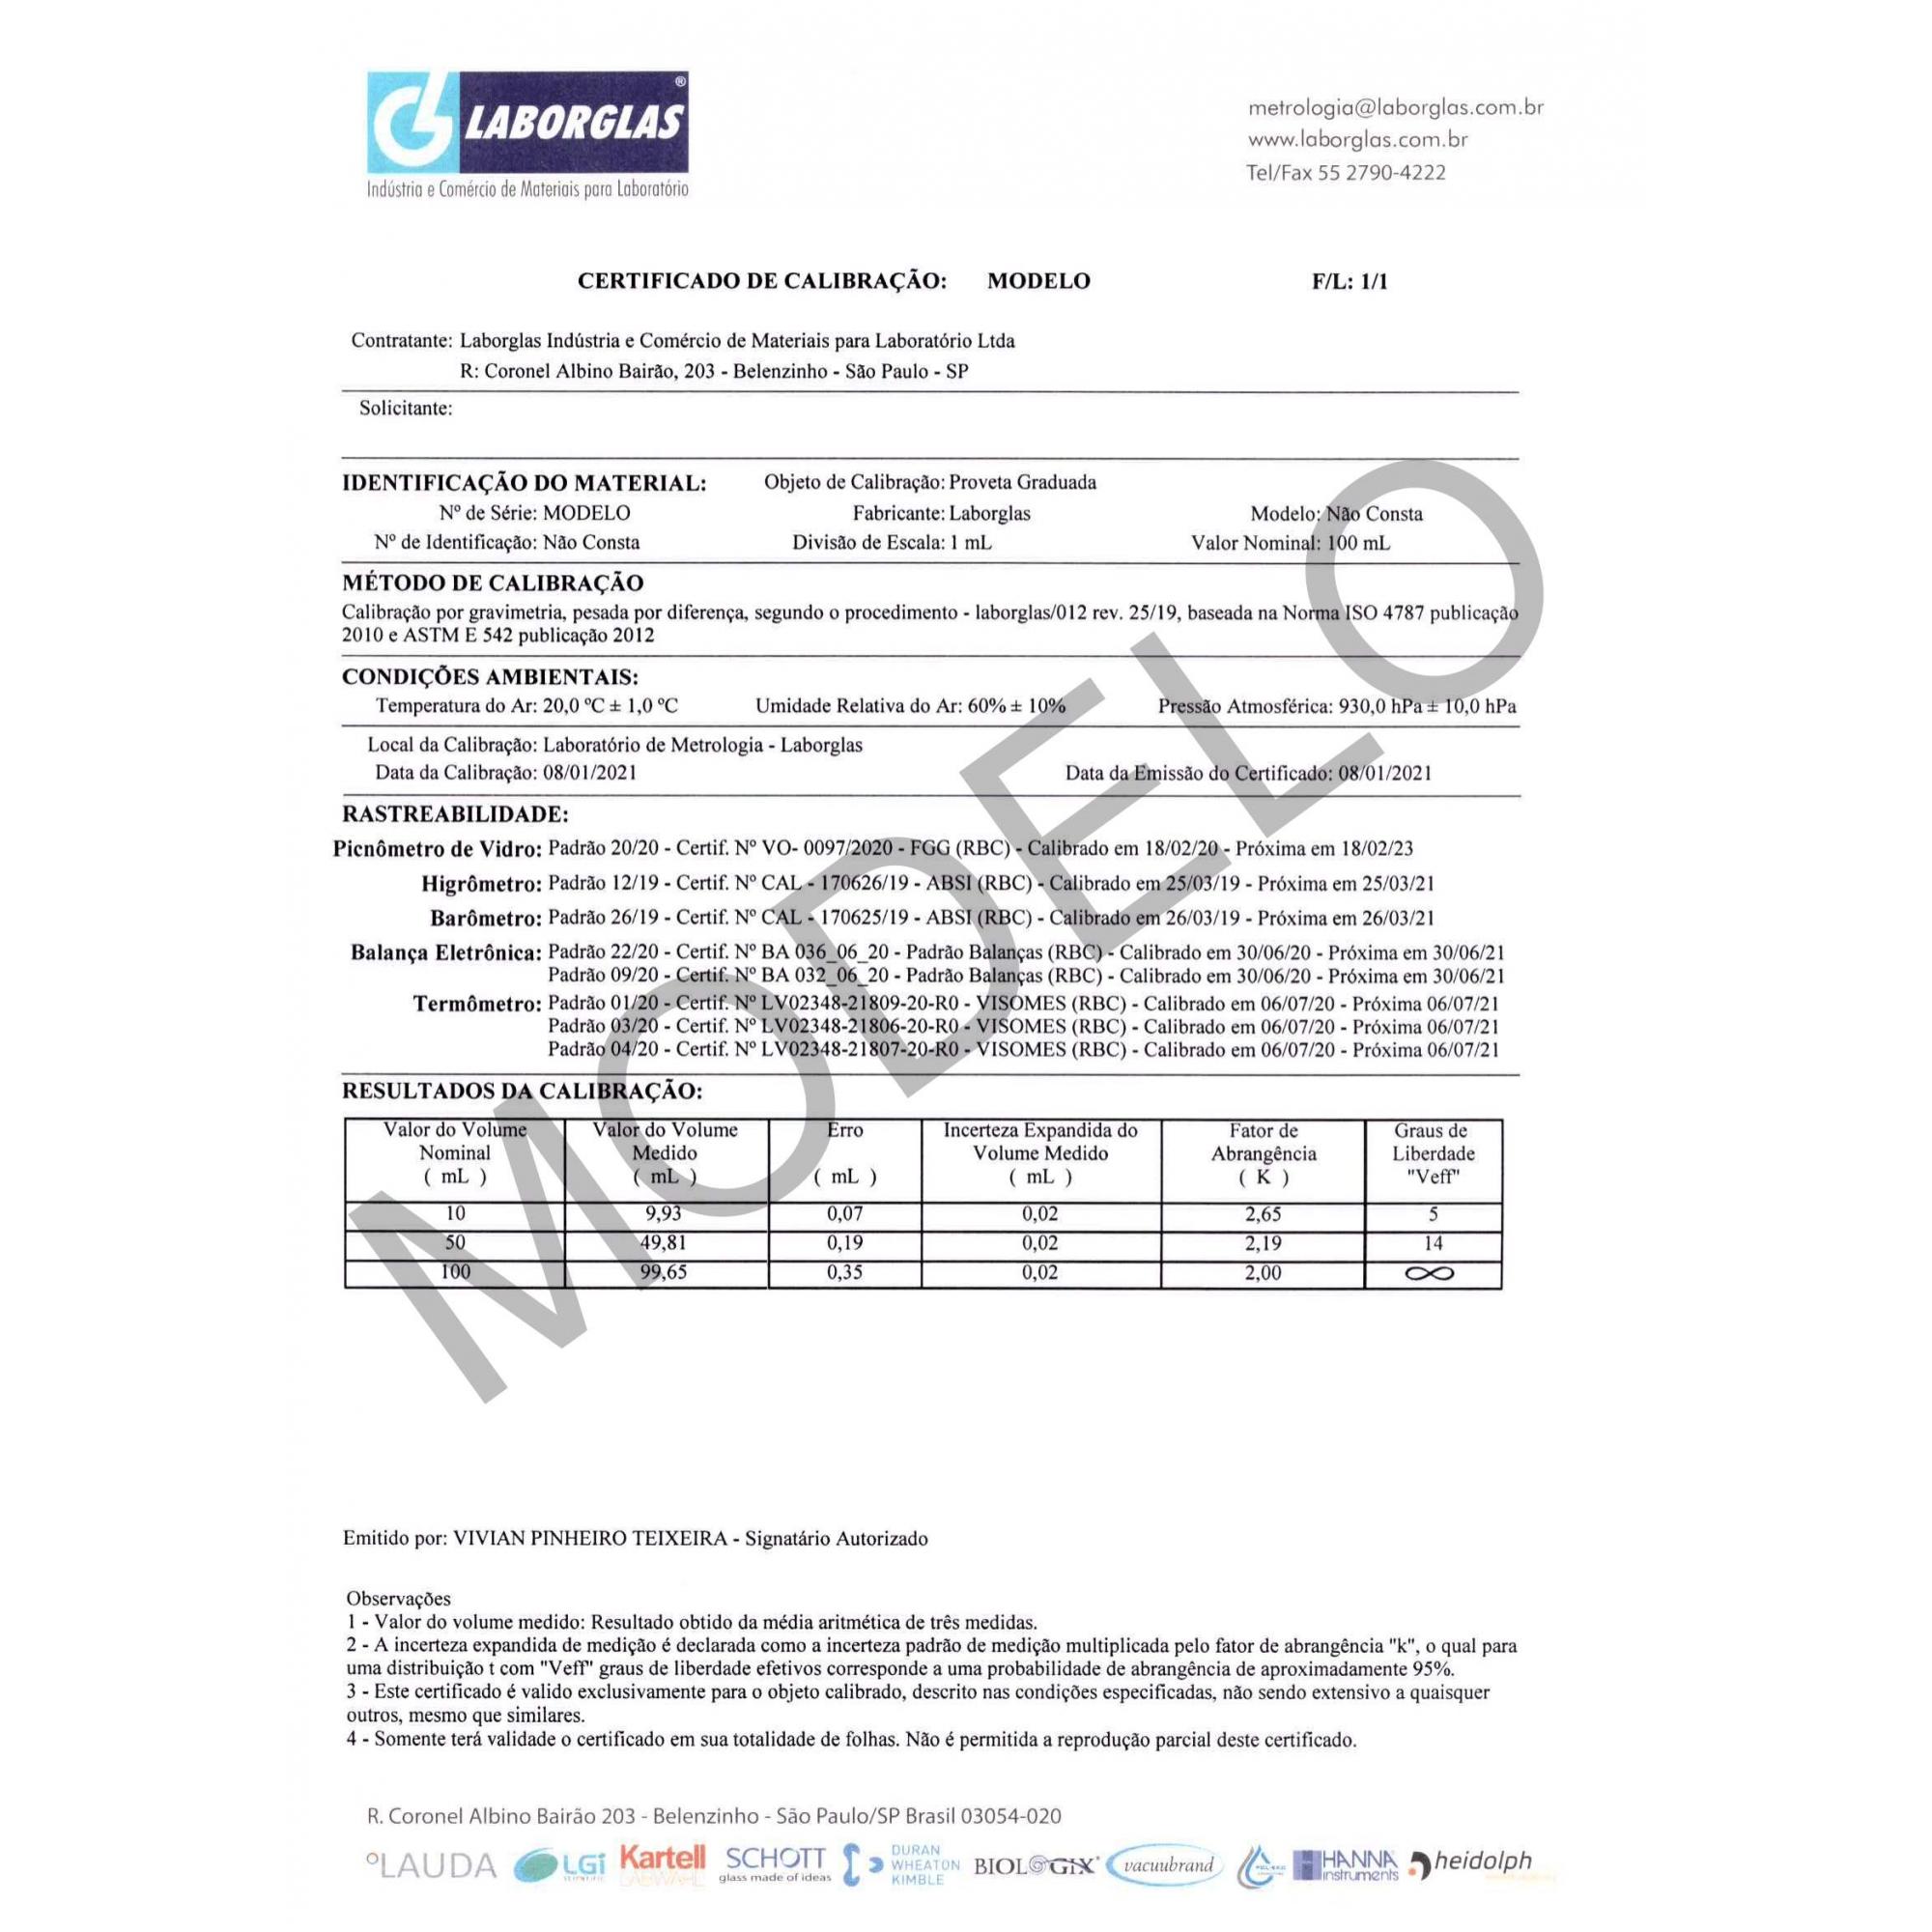 PROVETA GRADUADA BASE HEXAGONAL DE VIDRO 500 ML CLASSE A CERTIFICADO RASTREÁVEL - Laborglas - Cód. 9139744-C